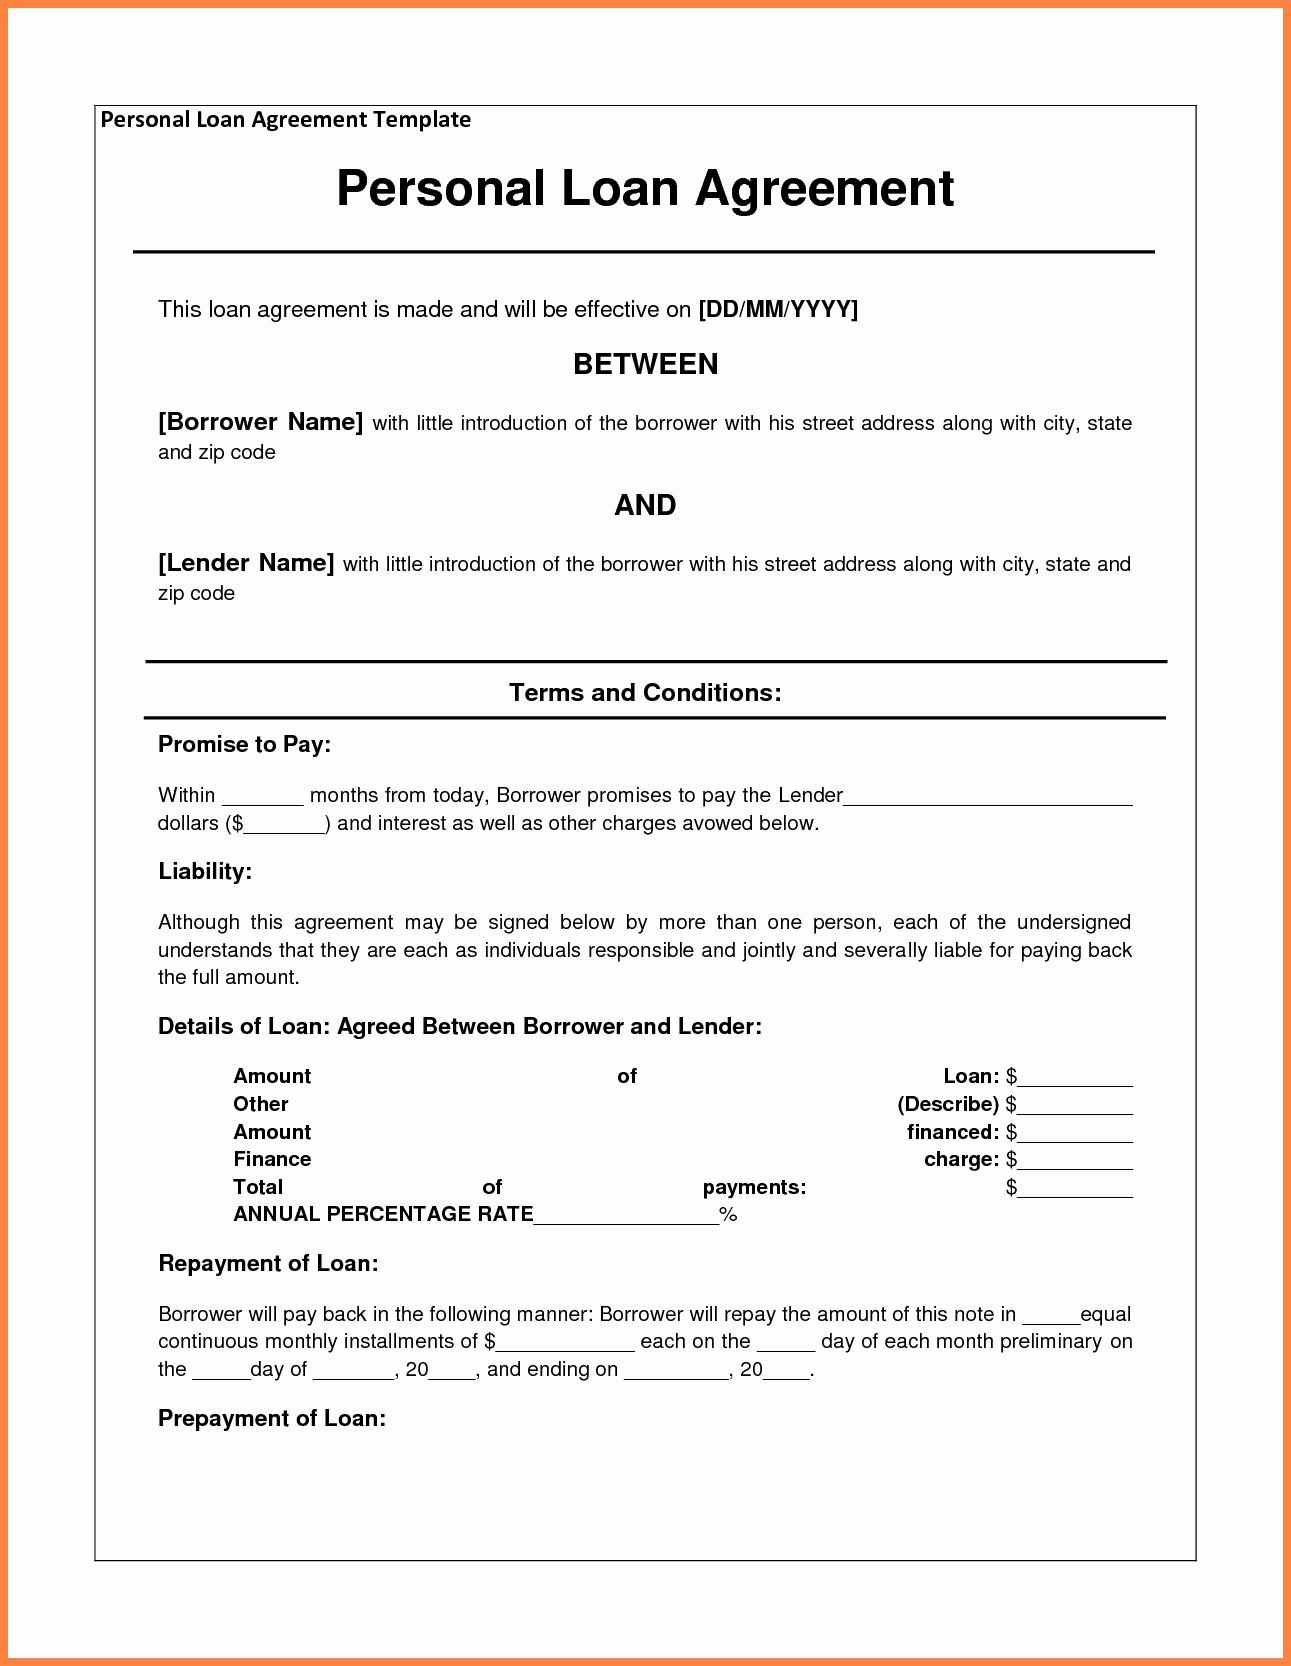 4 Personal Loan Agreement Template Between Friends